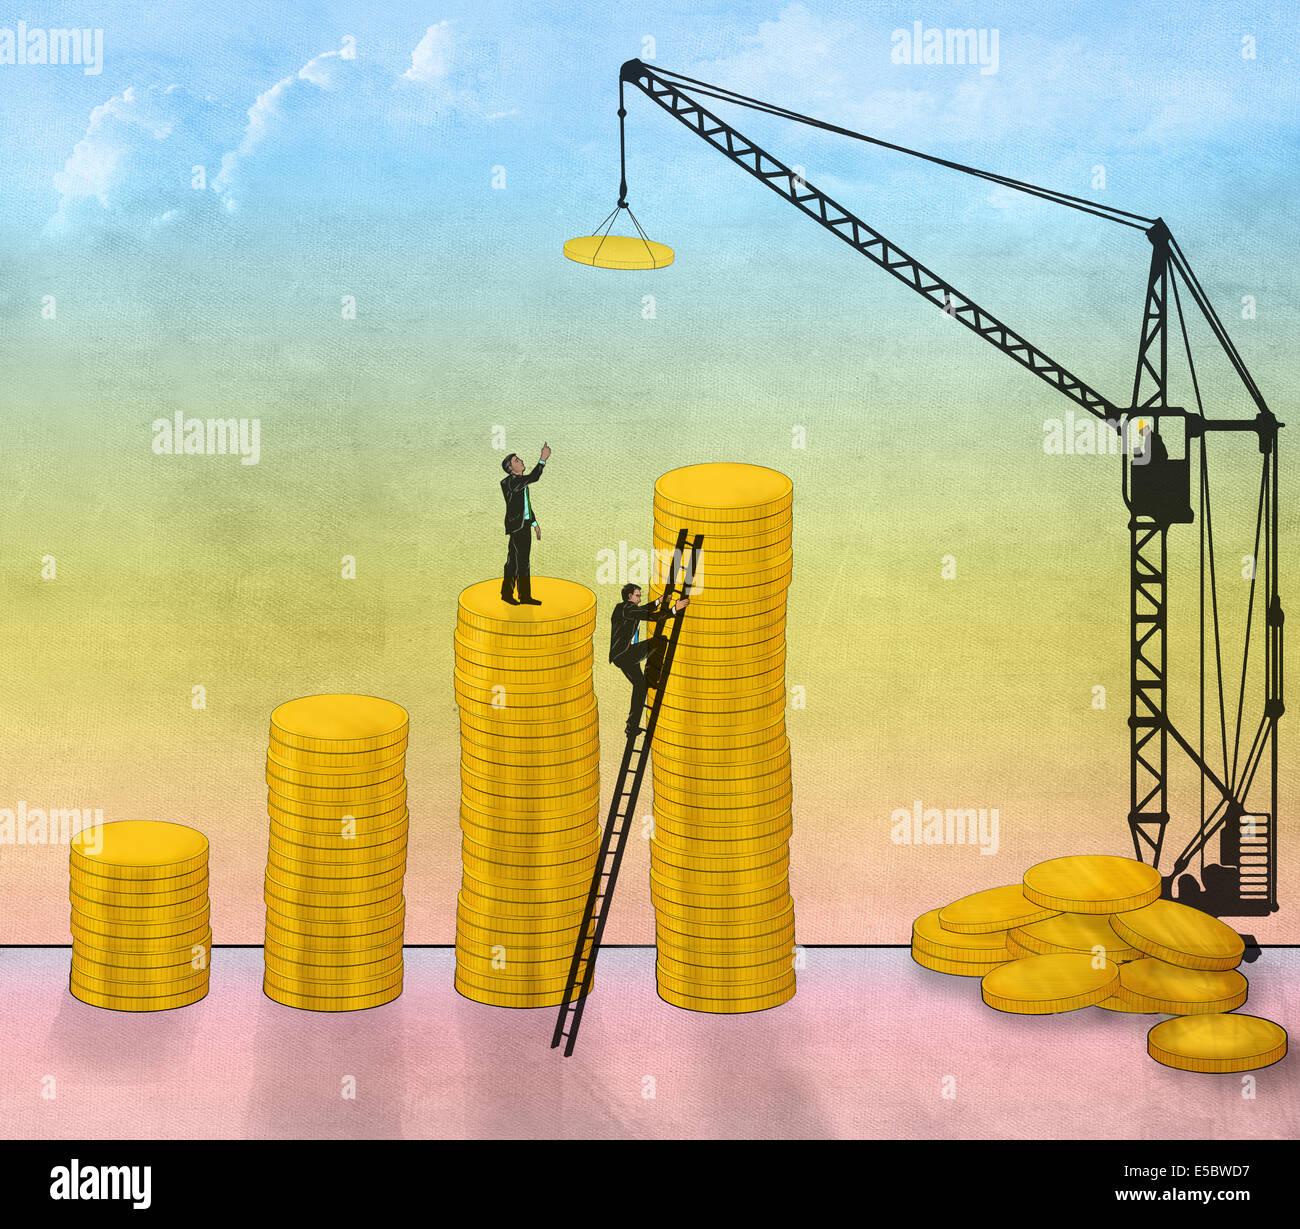 Illustrative image of businessmen constructing coin bar graph representing business development - Stock Image